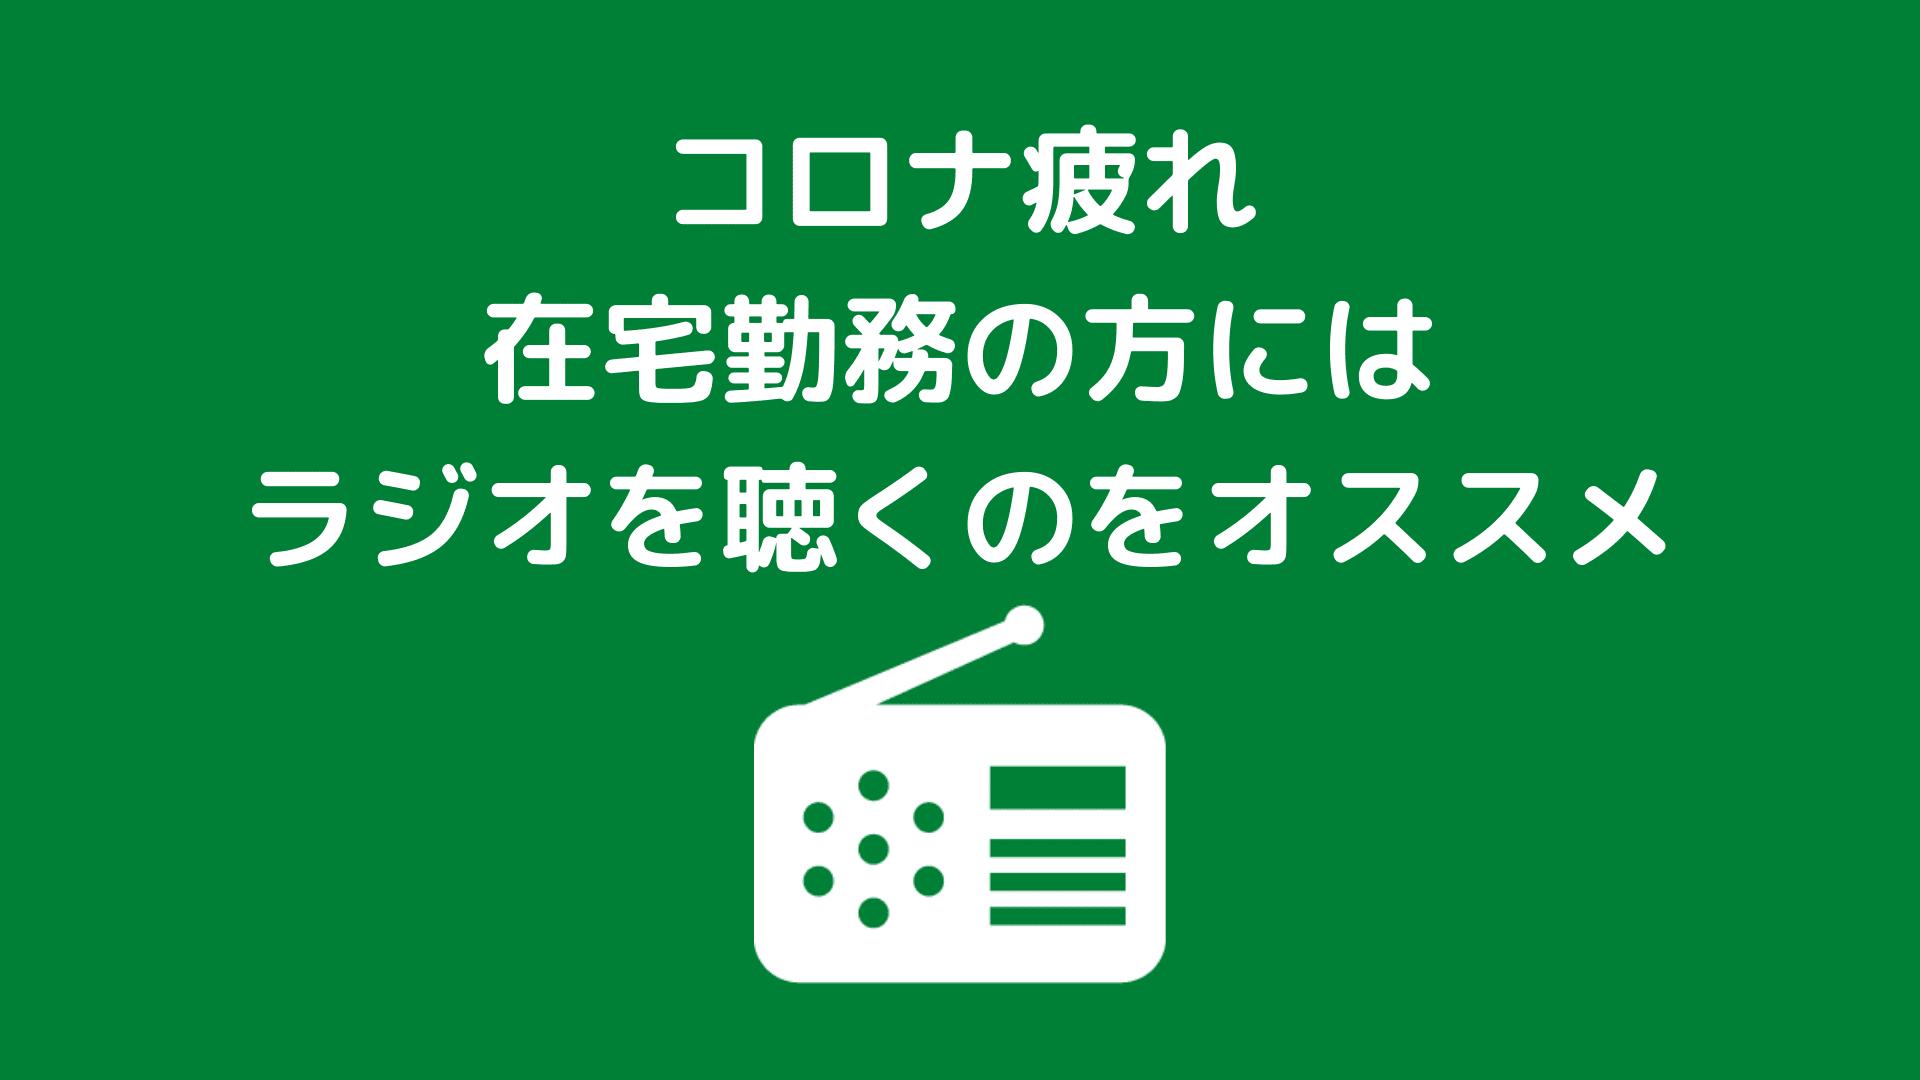 0001 5991235270